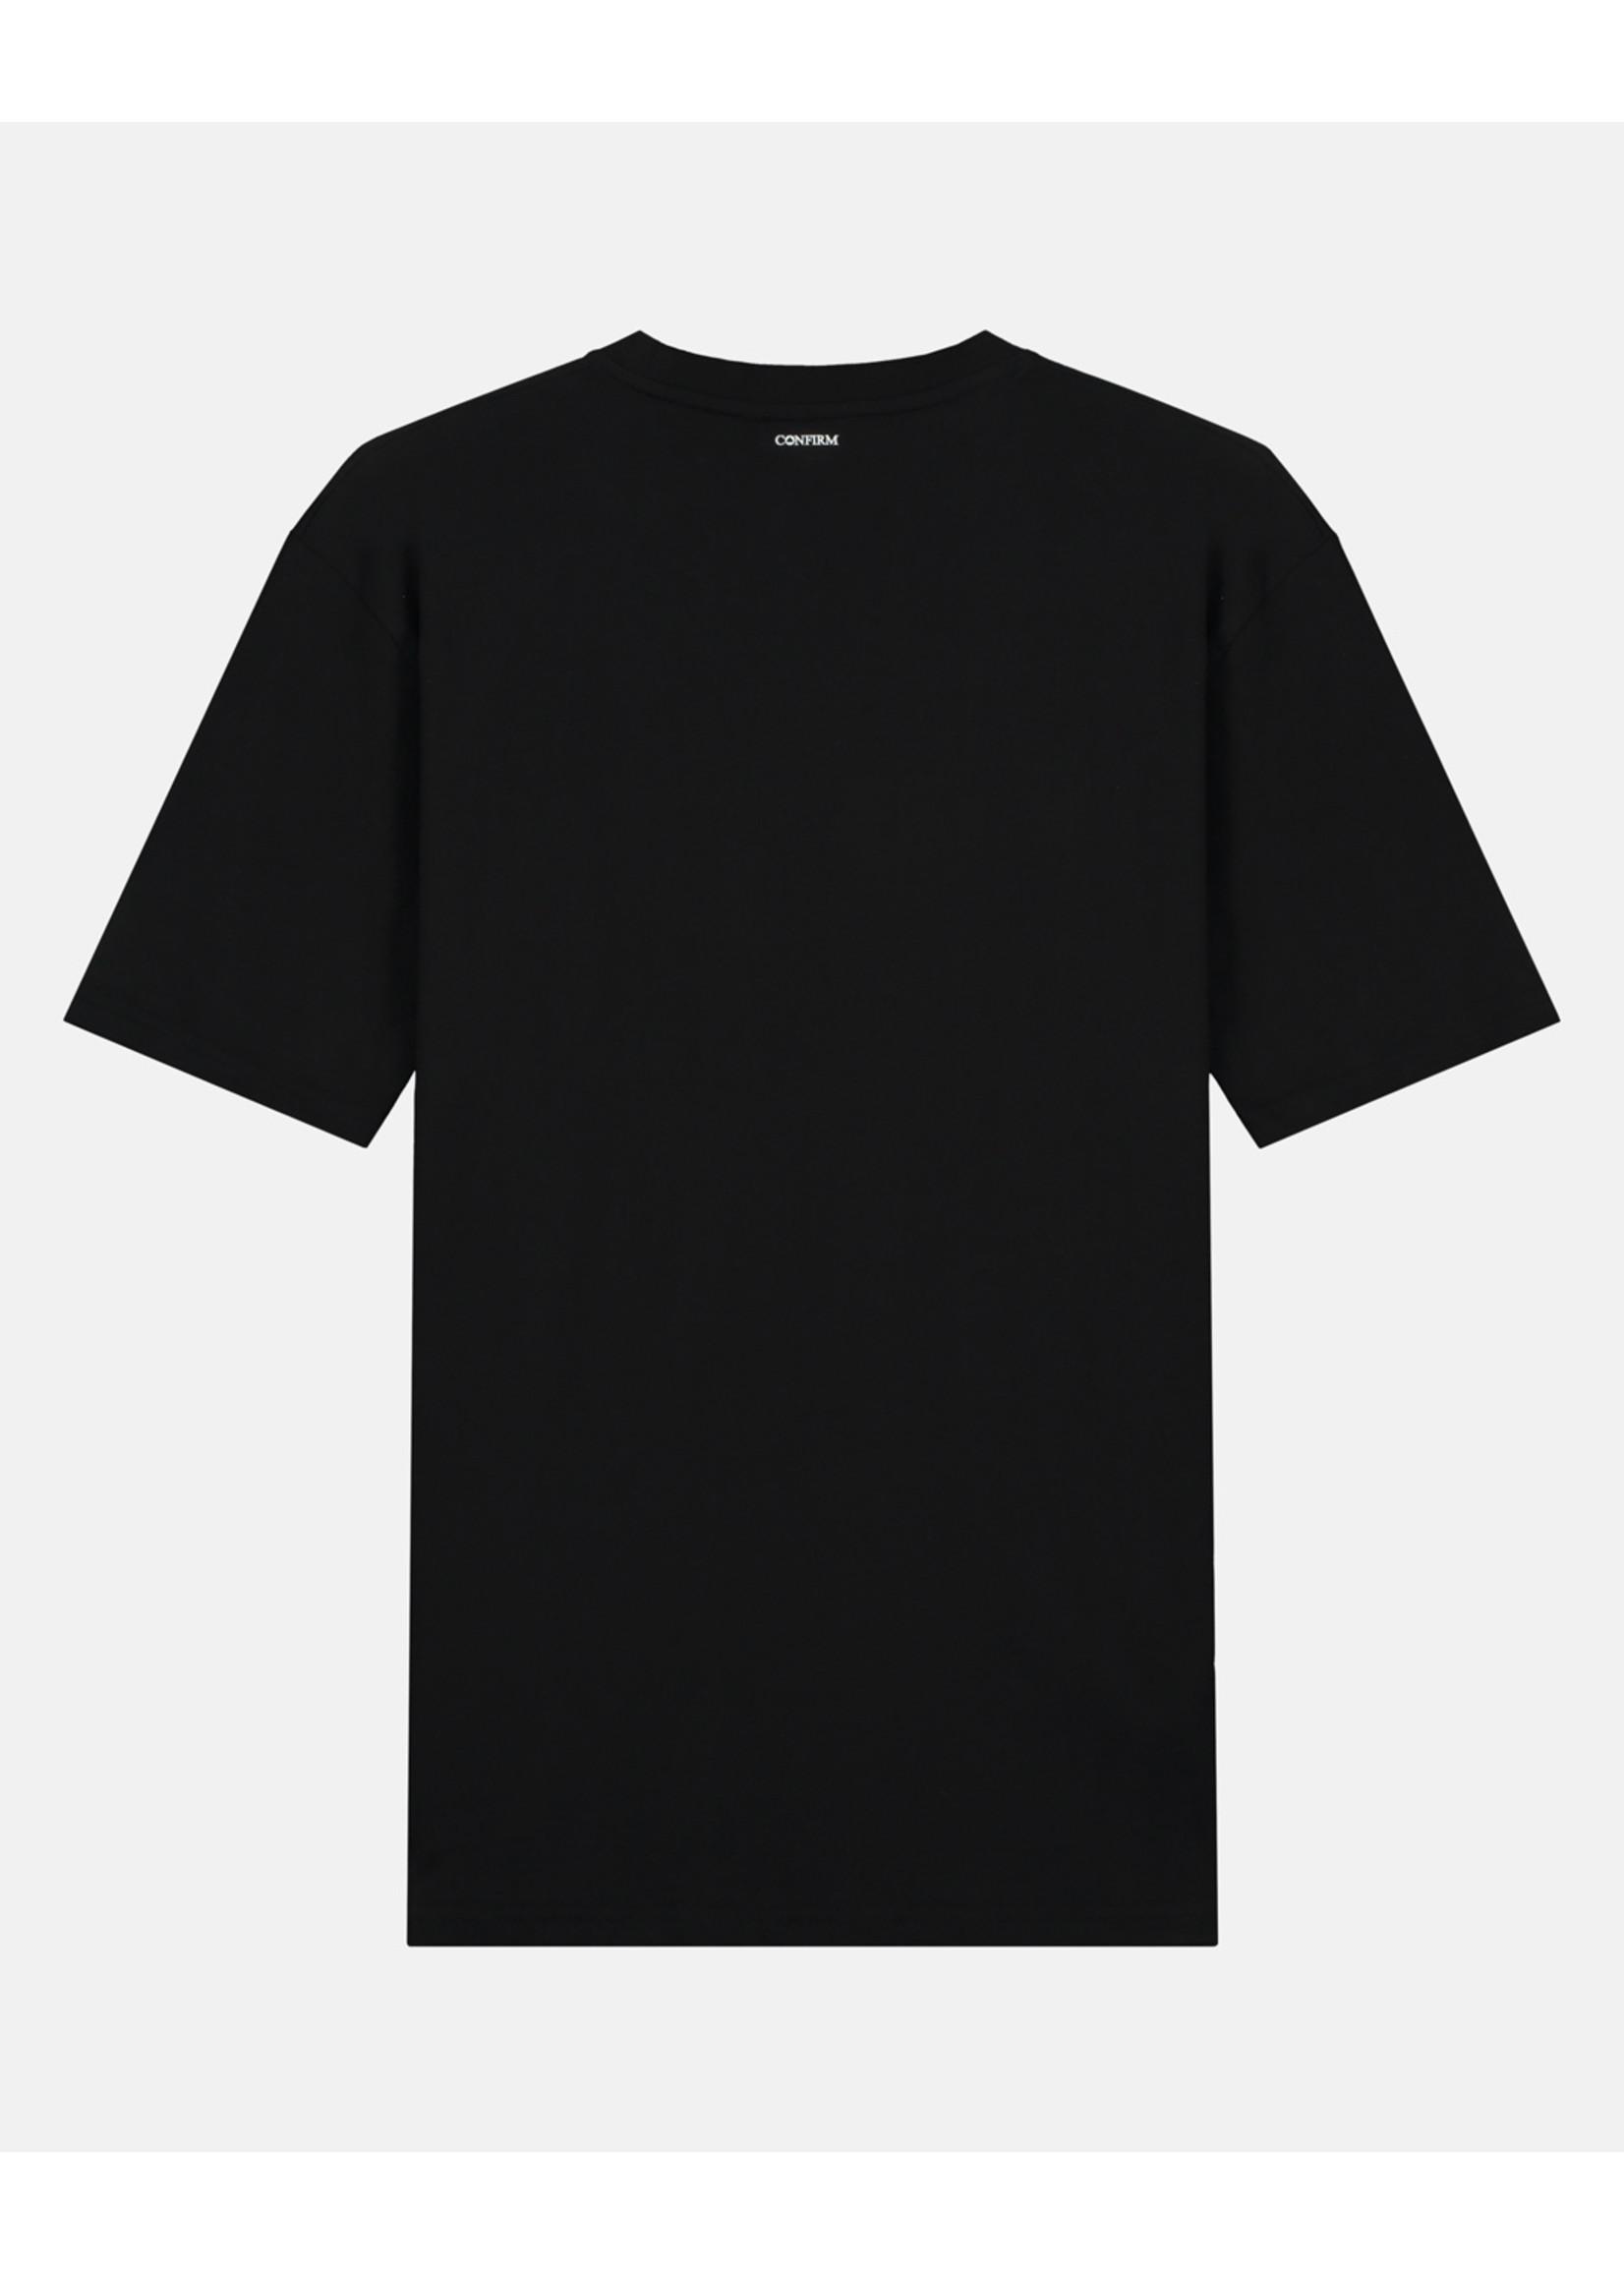 Confirm brand T-shirt identity - neon yellow